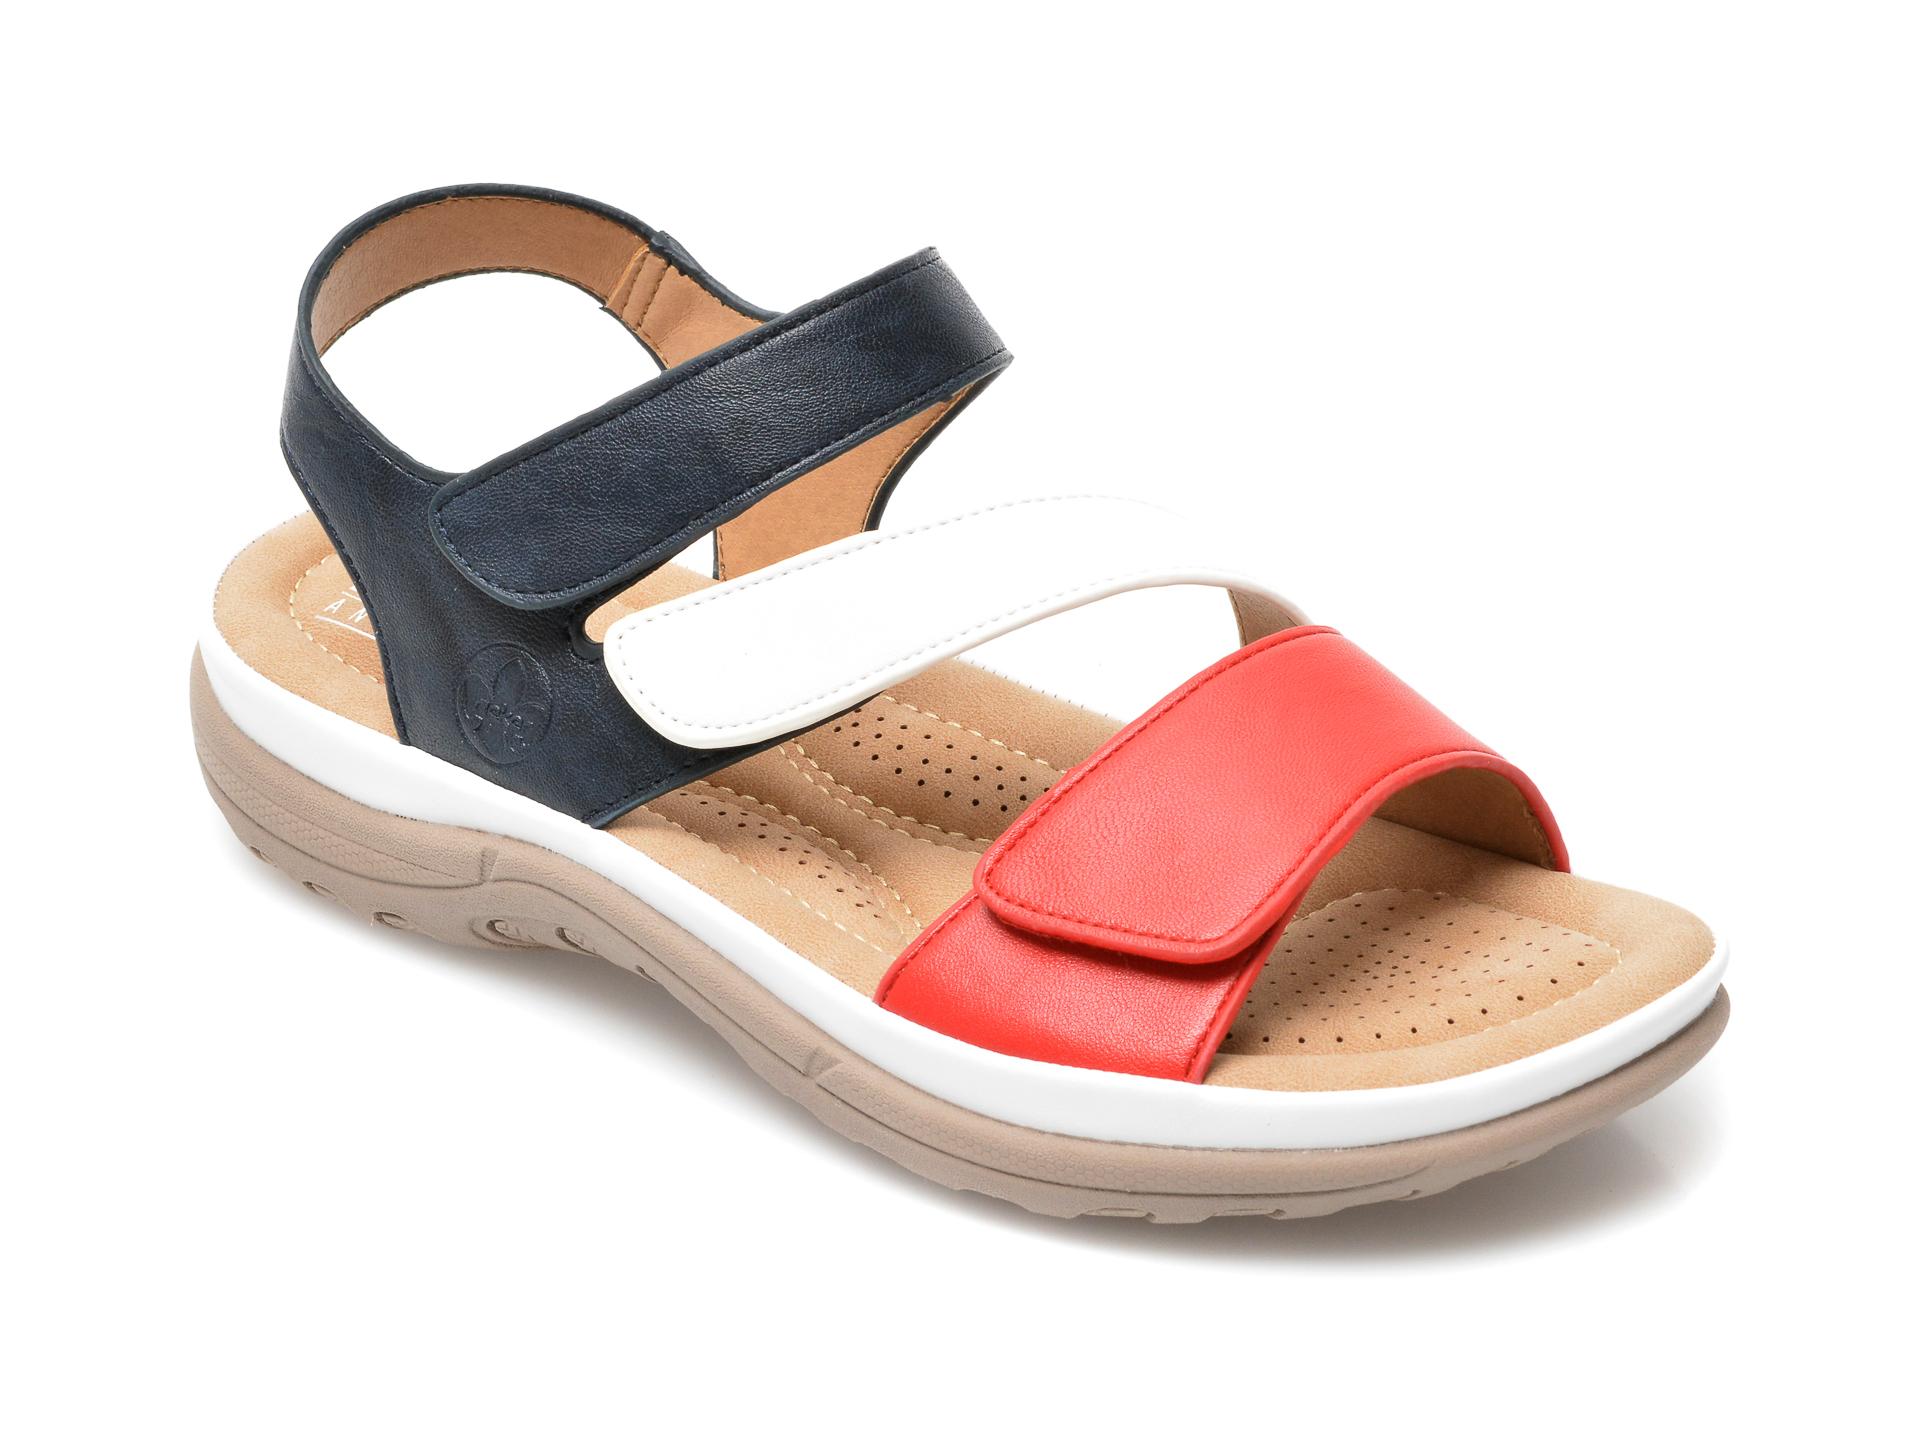 Sandale RIEKER bleumarin, V8872, din piele ecologica